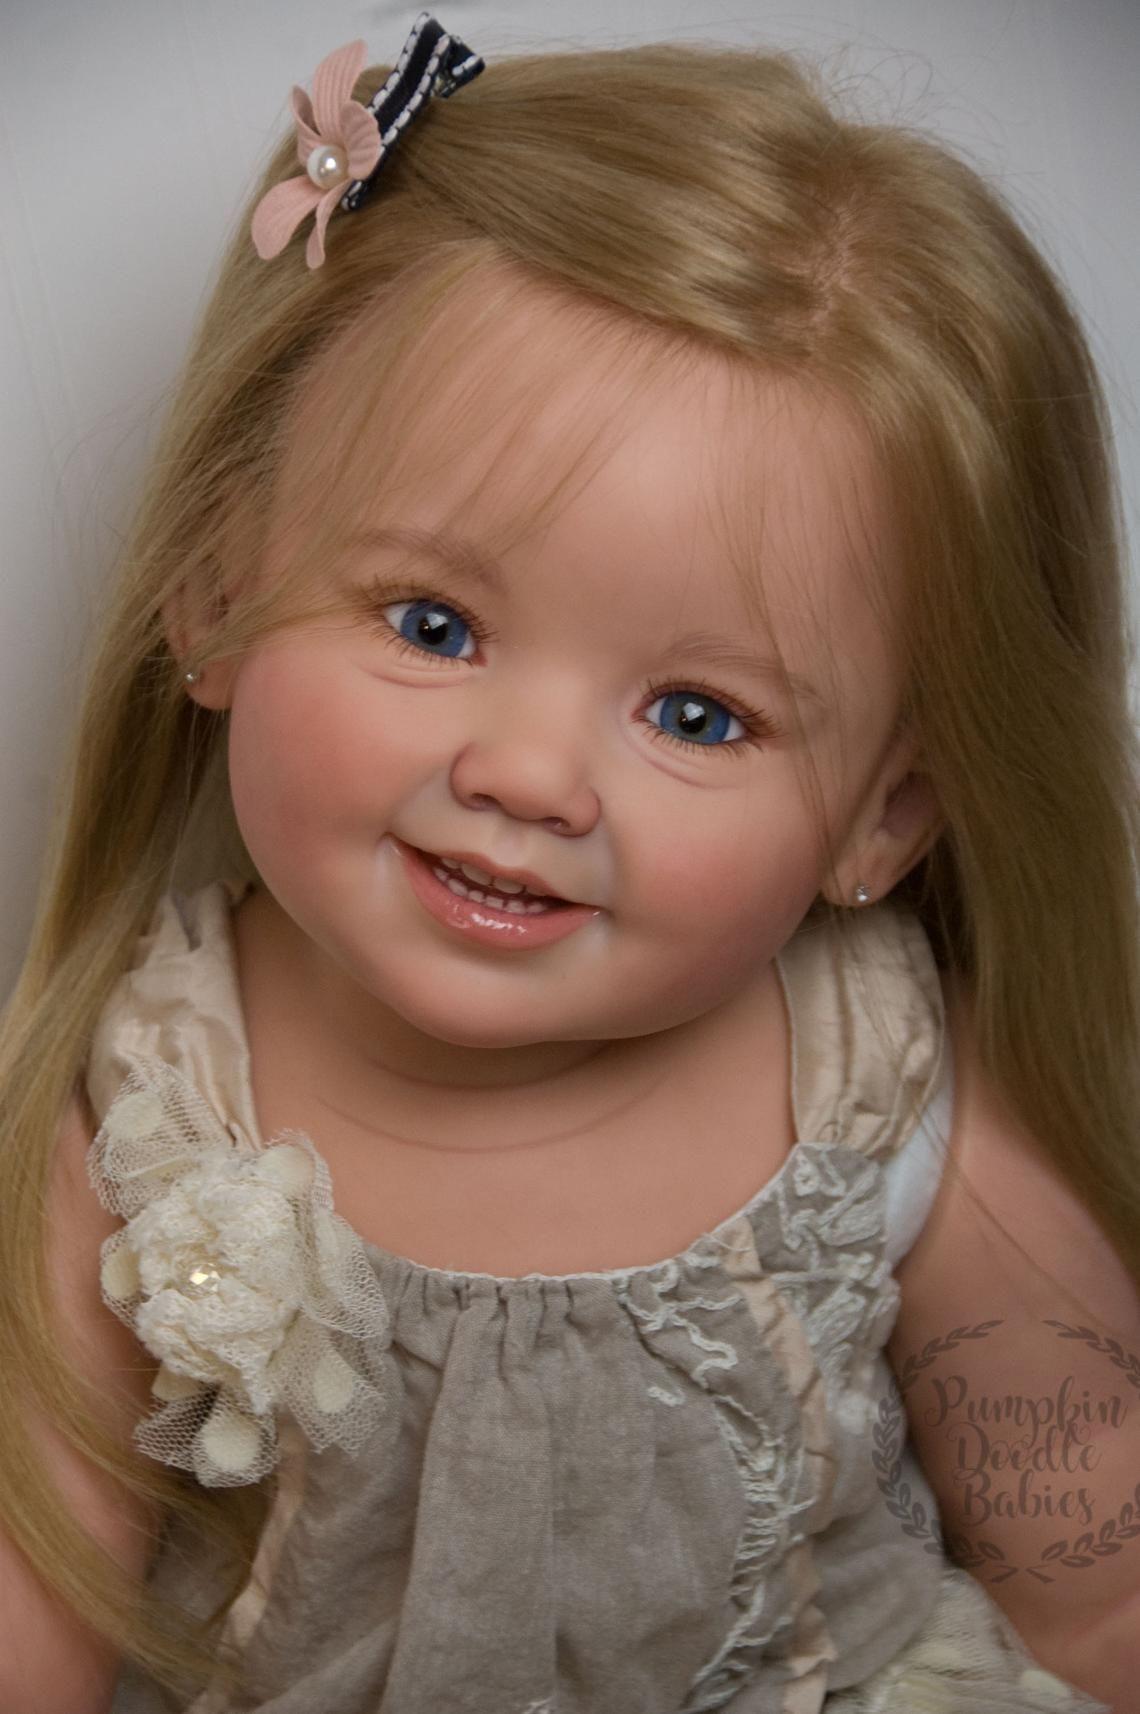 Custom Order Reborn Toddler Doll Baby Girl Cammi By Ping Lau Etsy Reborn Toddler Dolls Reborn Toddler Realistic Baby Dolls